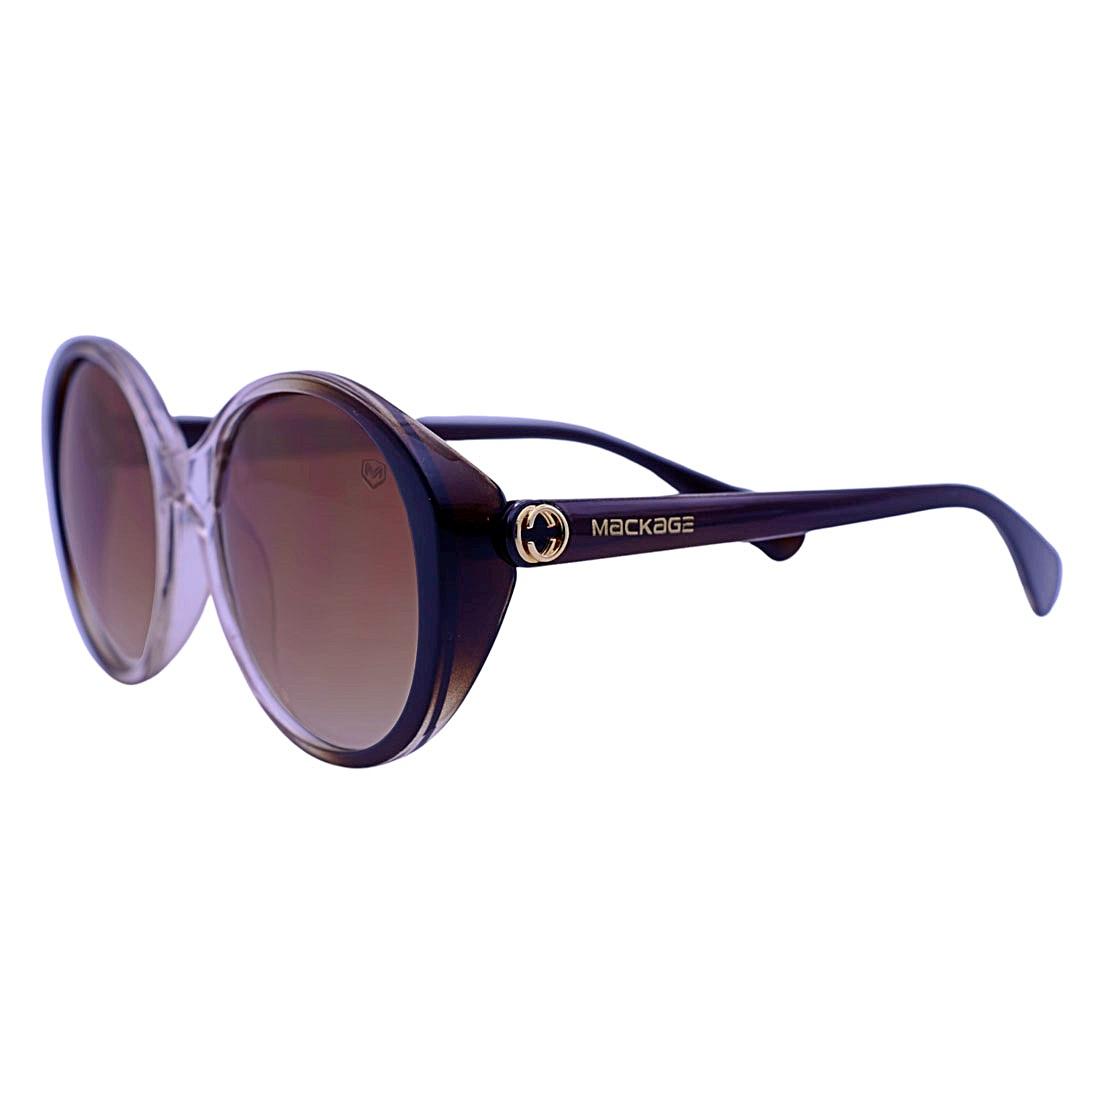 Óculos De Sol Mackage Feminino Oversize Retro - Marrom/Cristal